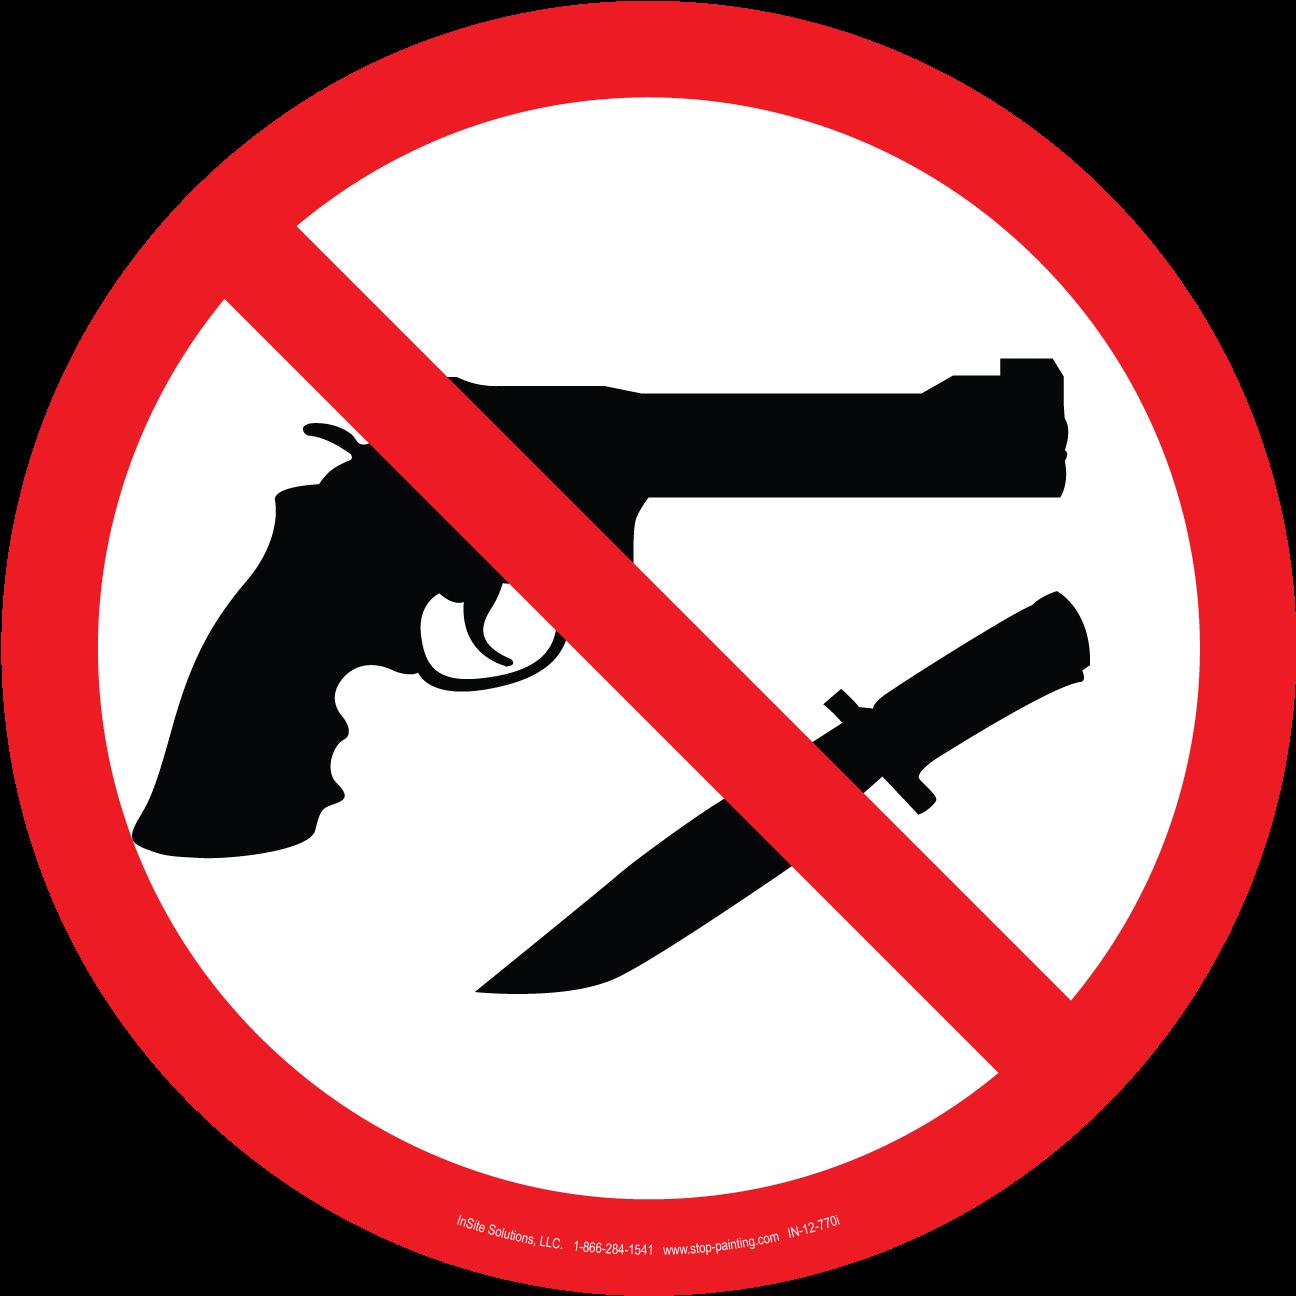 Guns and knives. Clipart gun knife